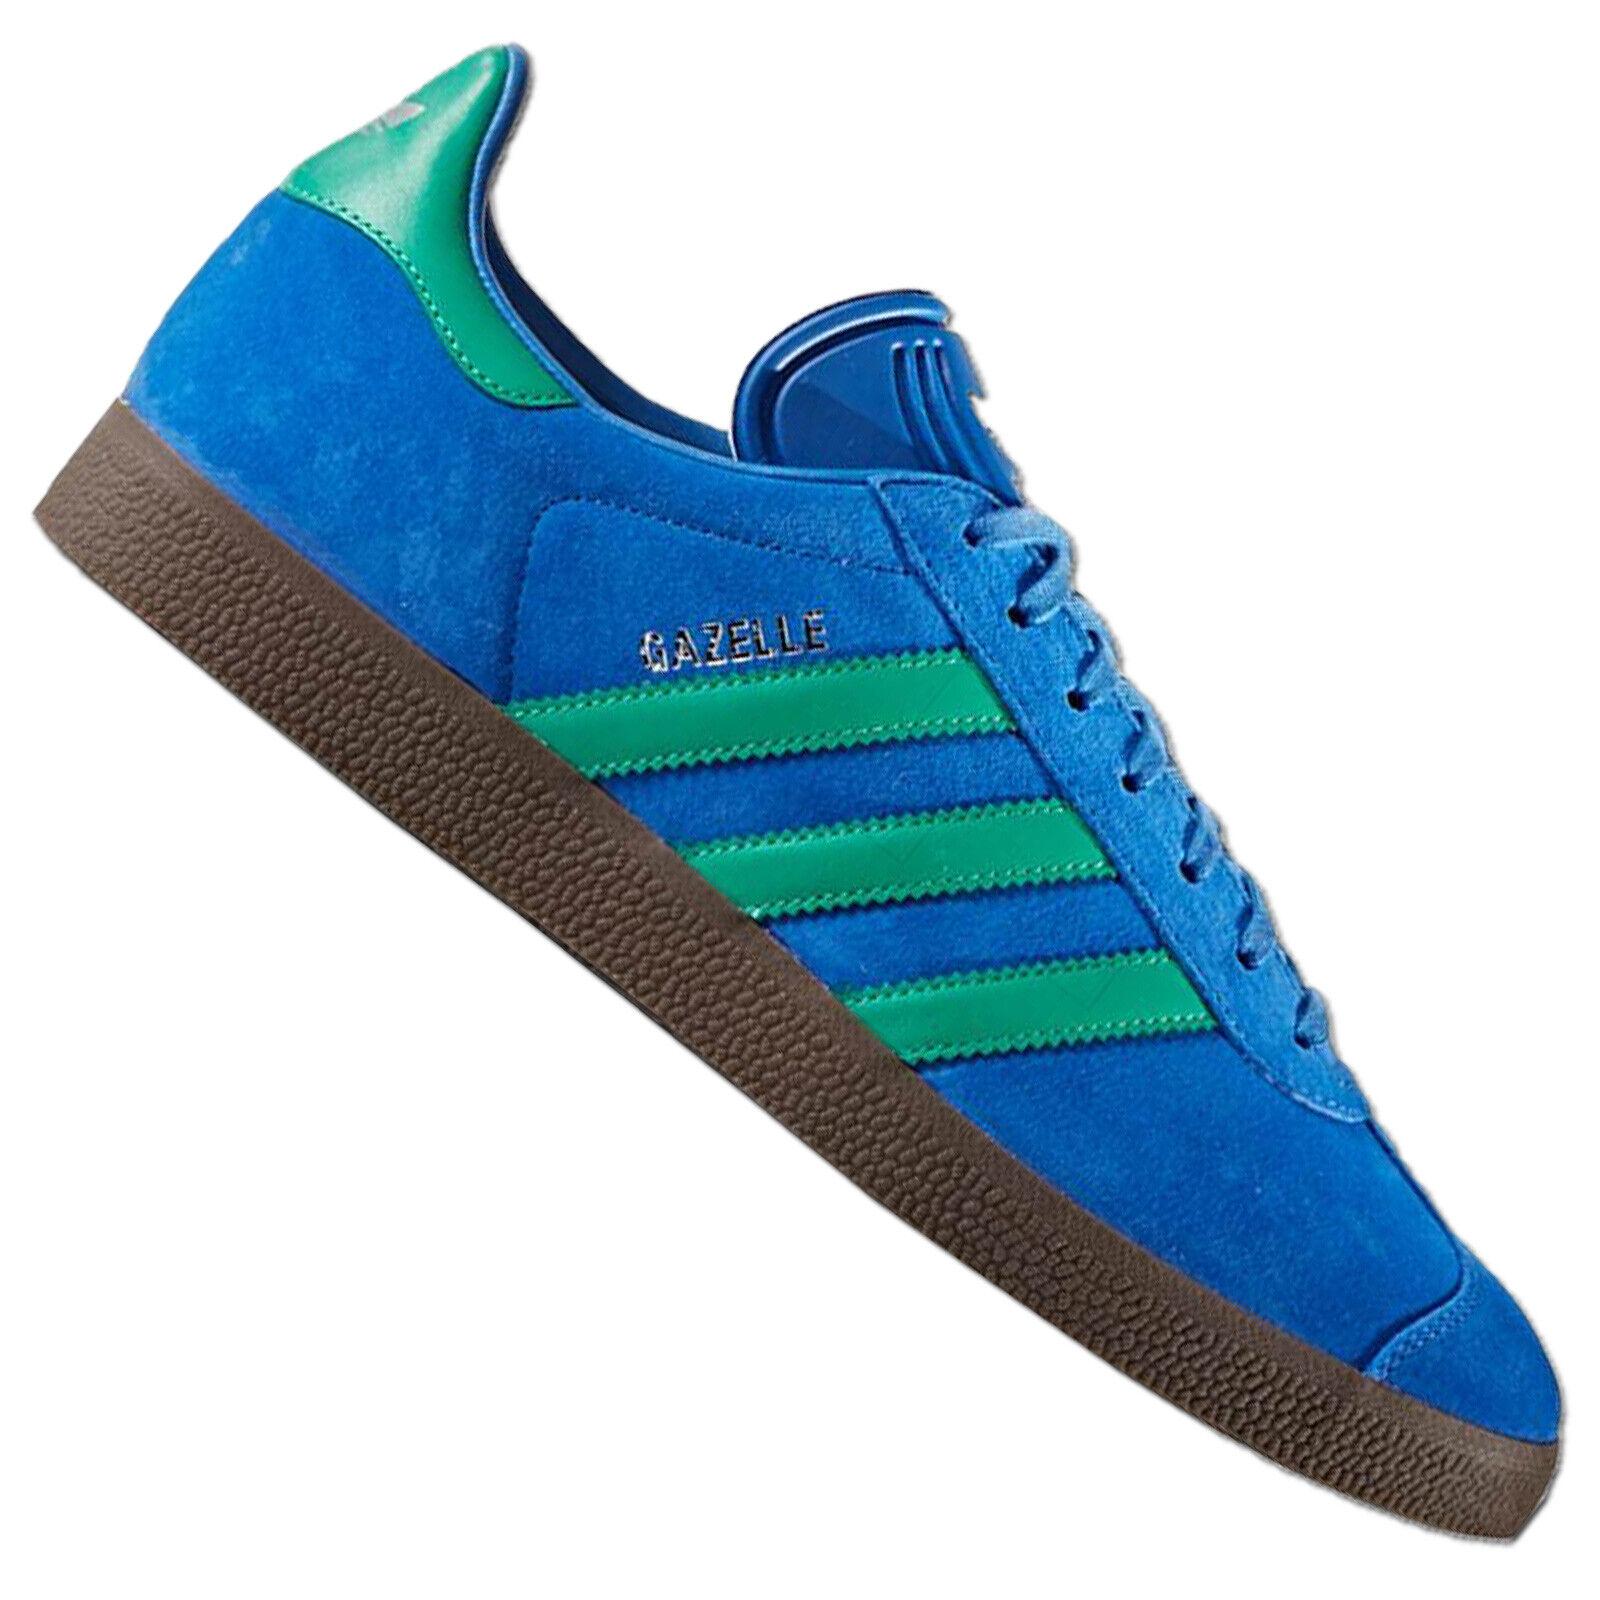 Adidas Originals Gazelle Women's Sneakers Bb2755 Suede Trainers bluee Green